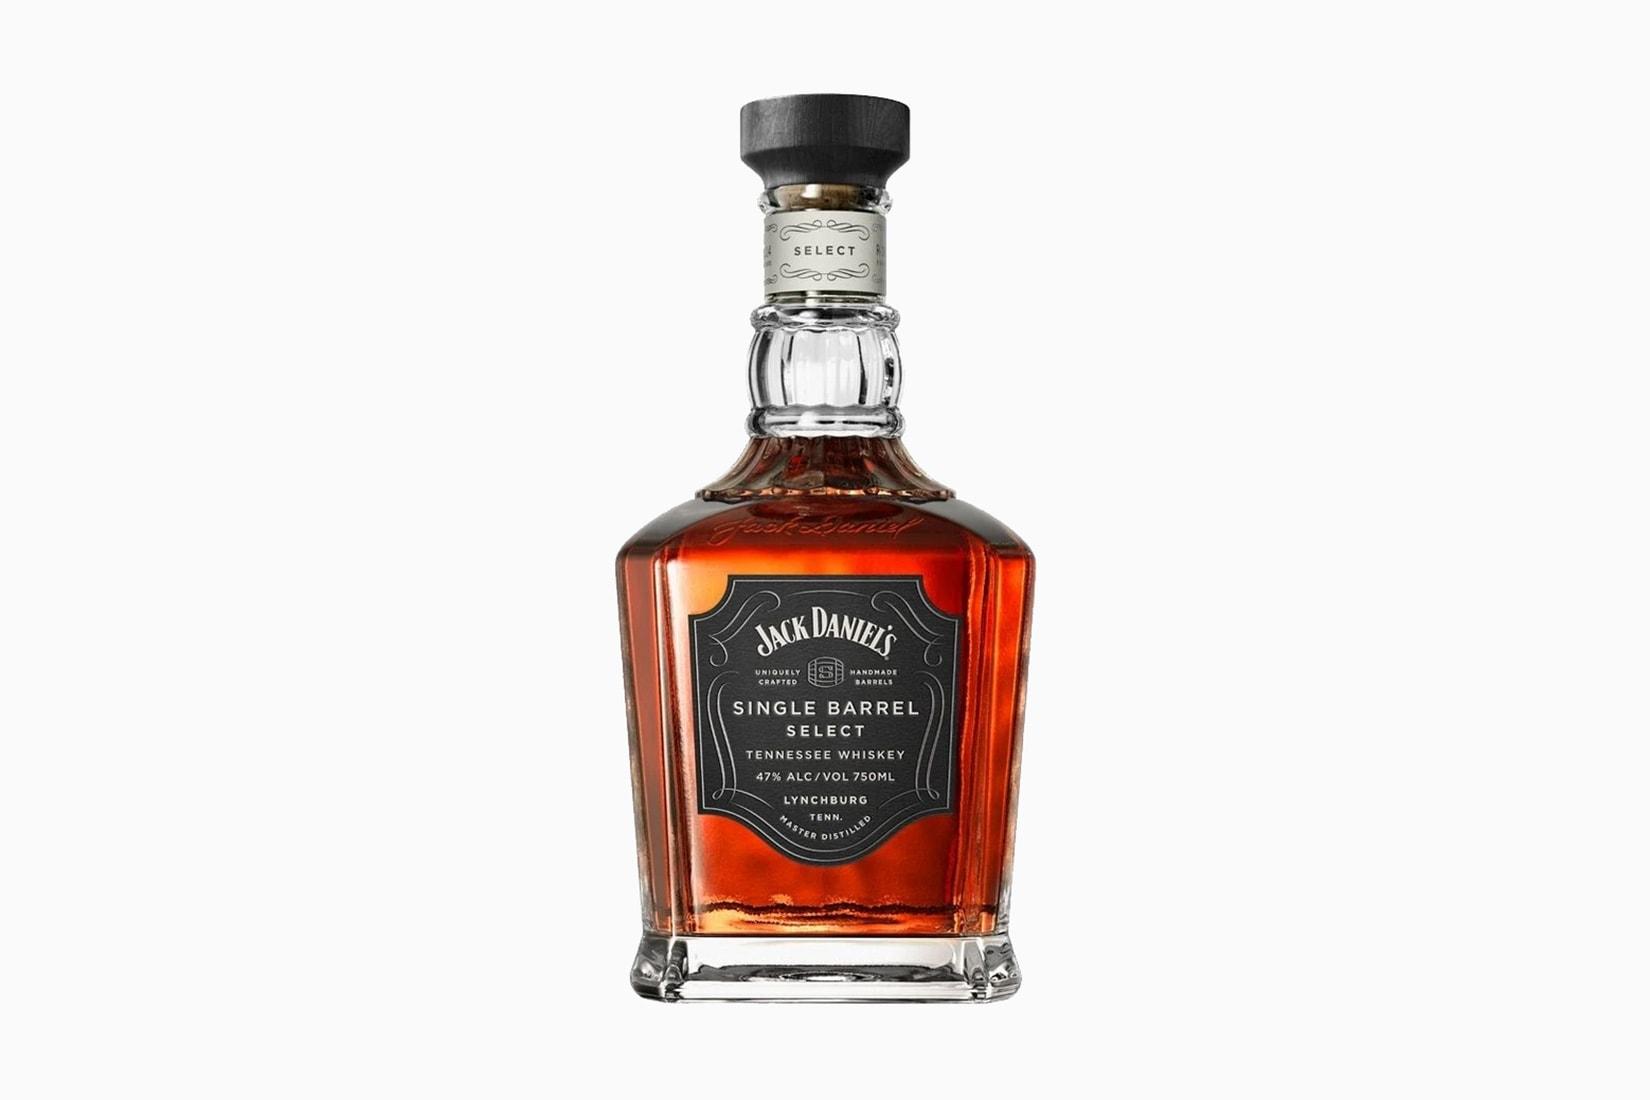 Tamaño de la botella de bourbon de Jack Daniel's - Luxe Digital